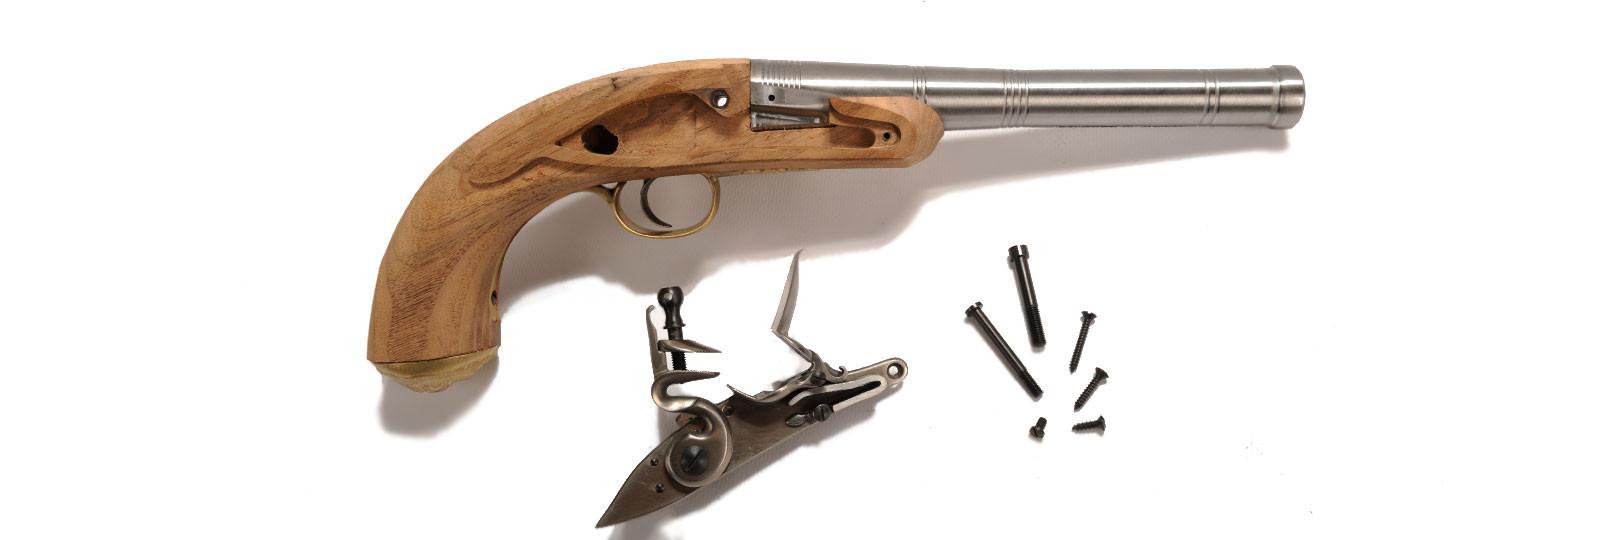 Queen Anne pistol kit